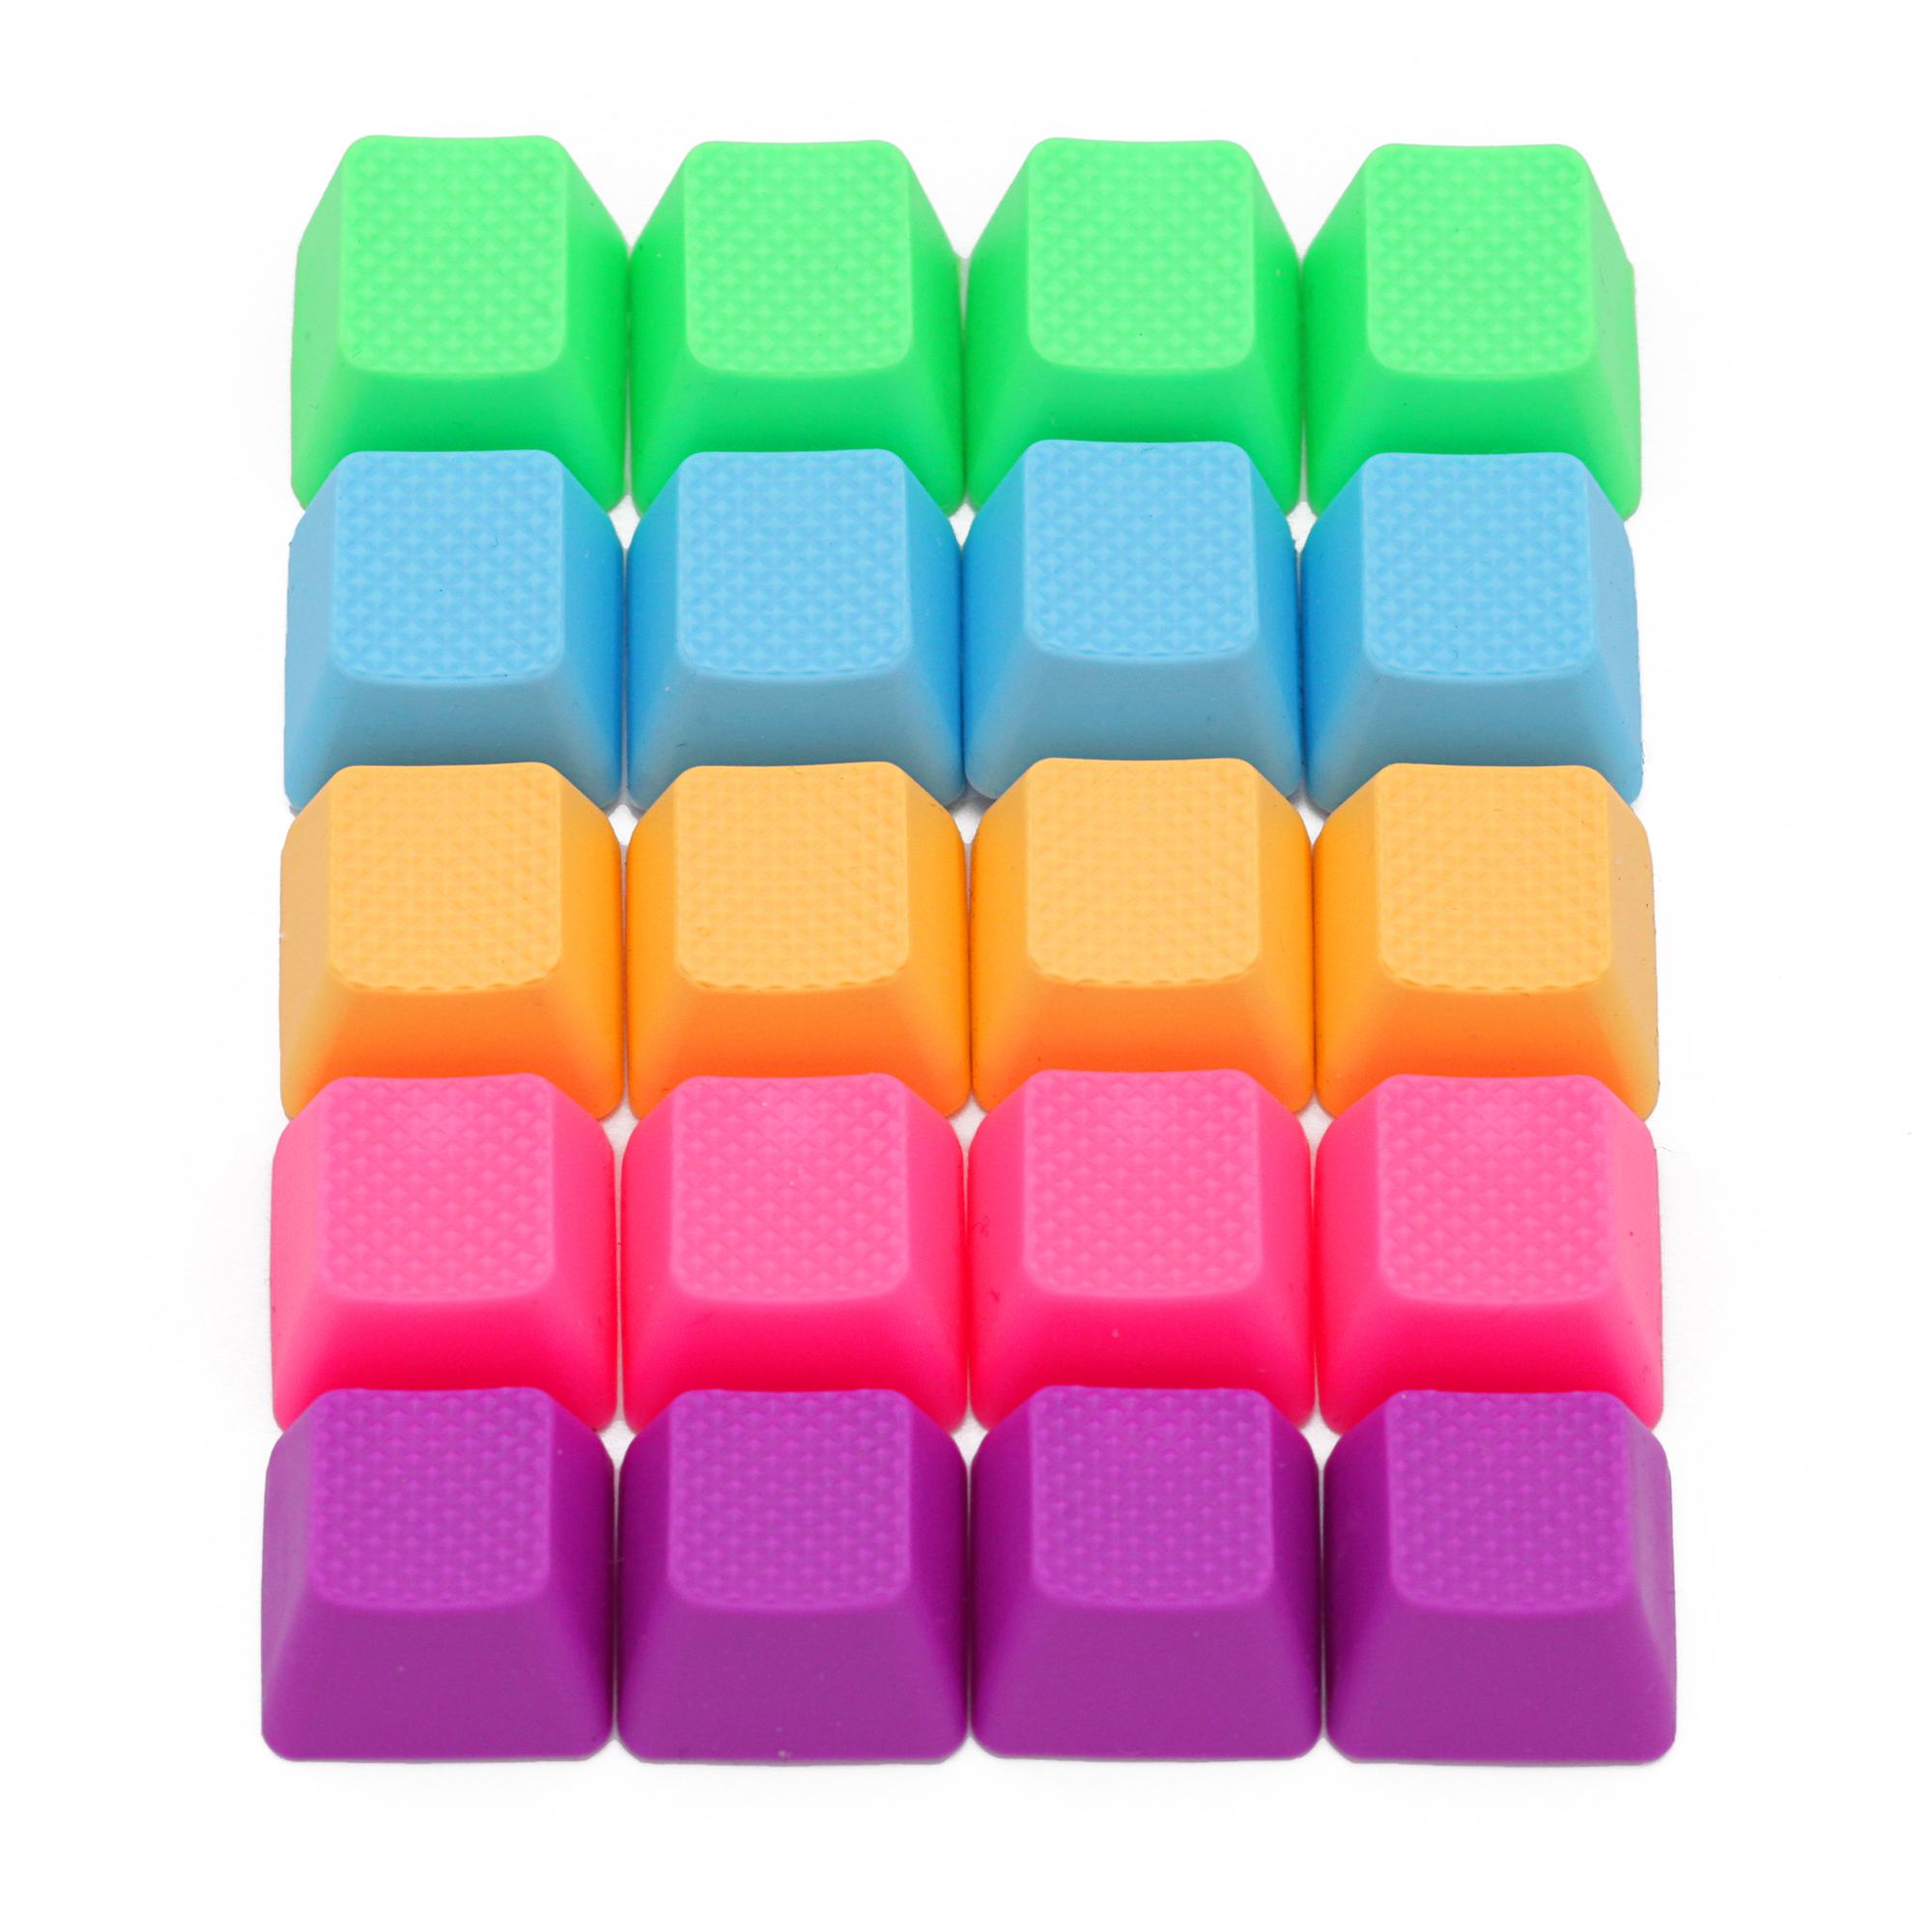 Taihao Rubber Gaming Keycap Set Rubberized Doubleshot Cherry MX OEM Profile 20 Key Magenta Purple Neon Green Yellow Light Blue